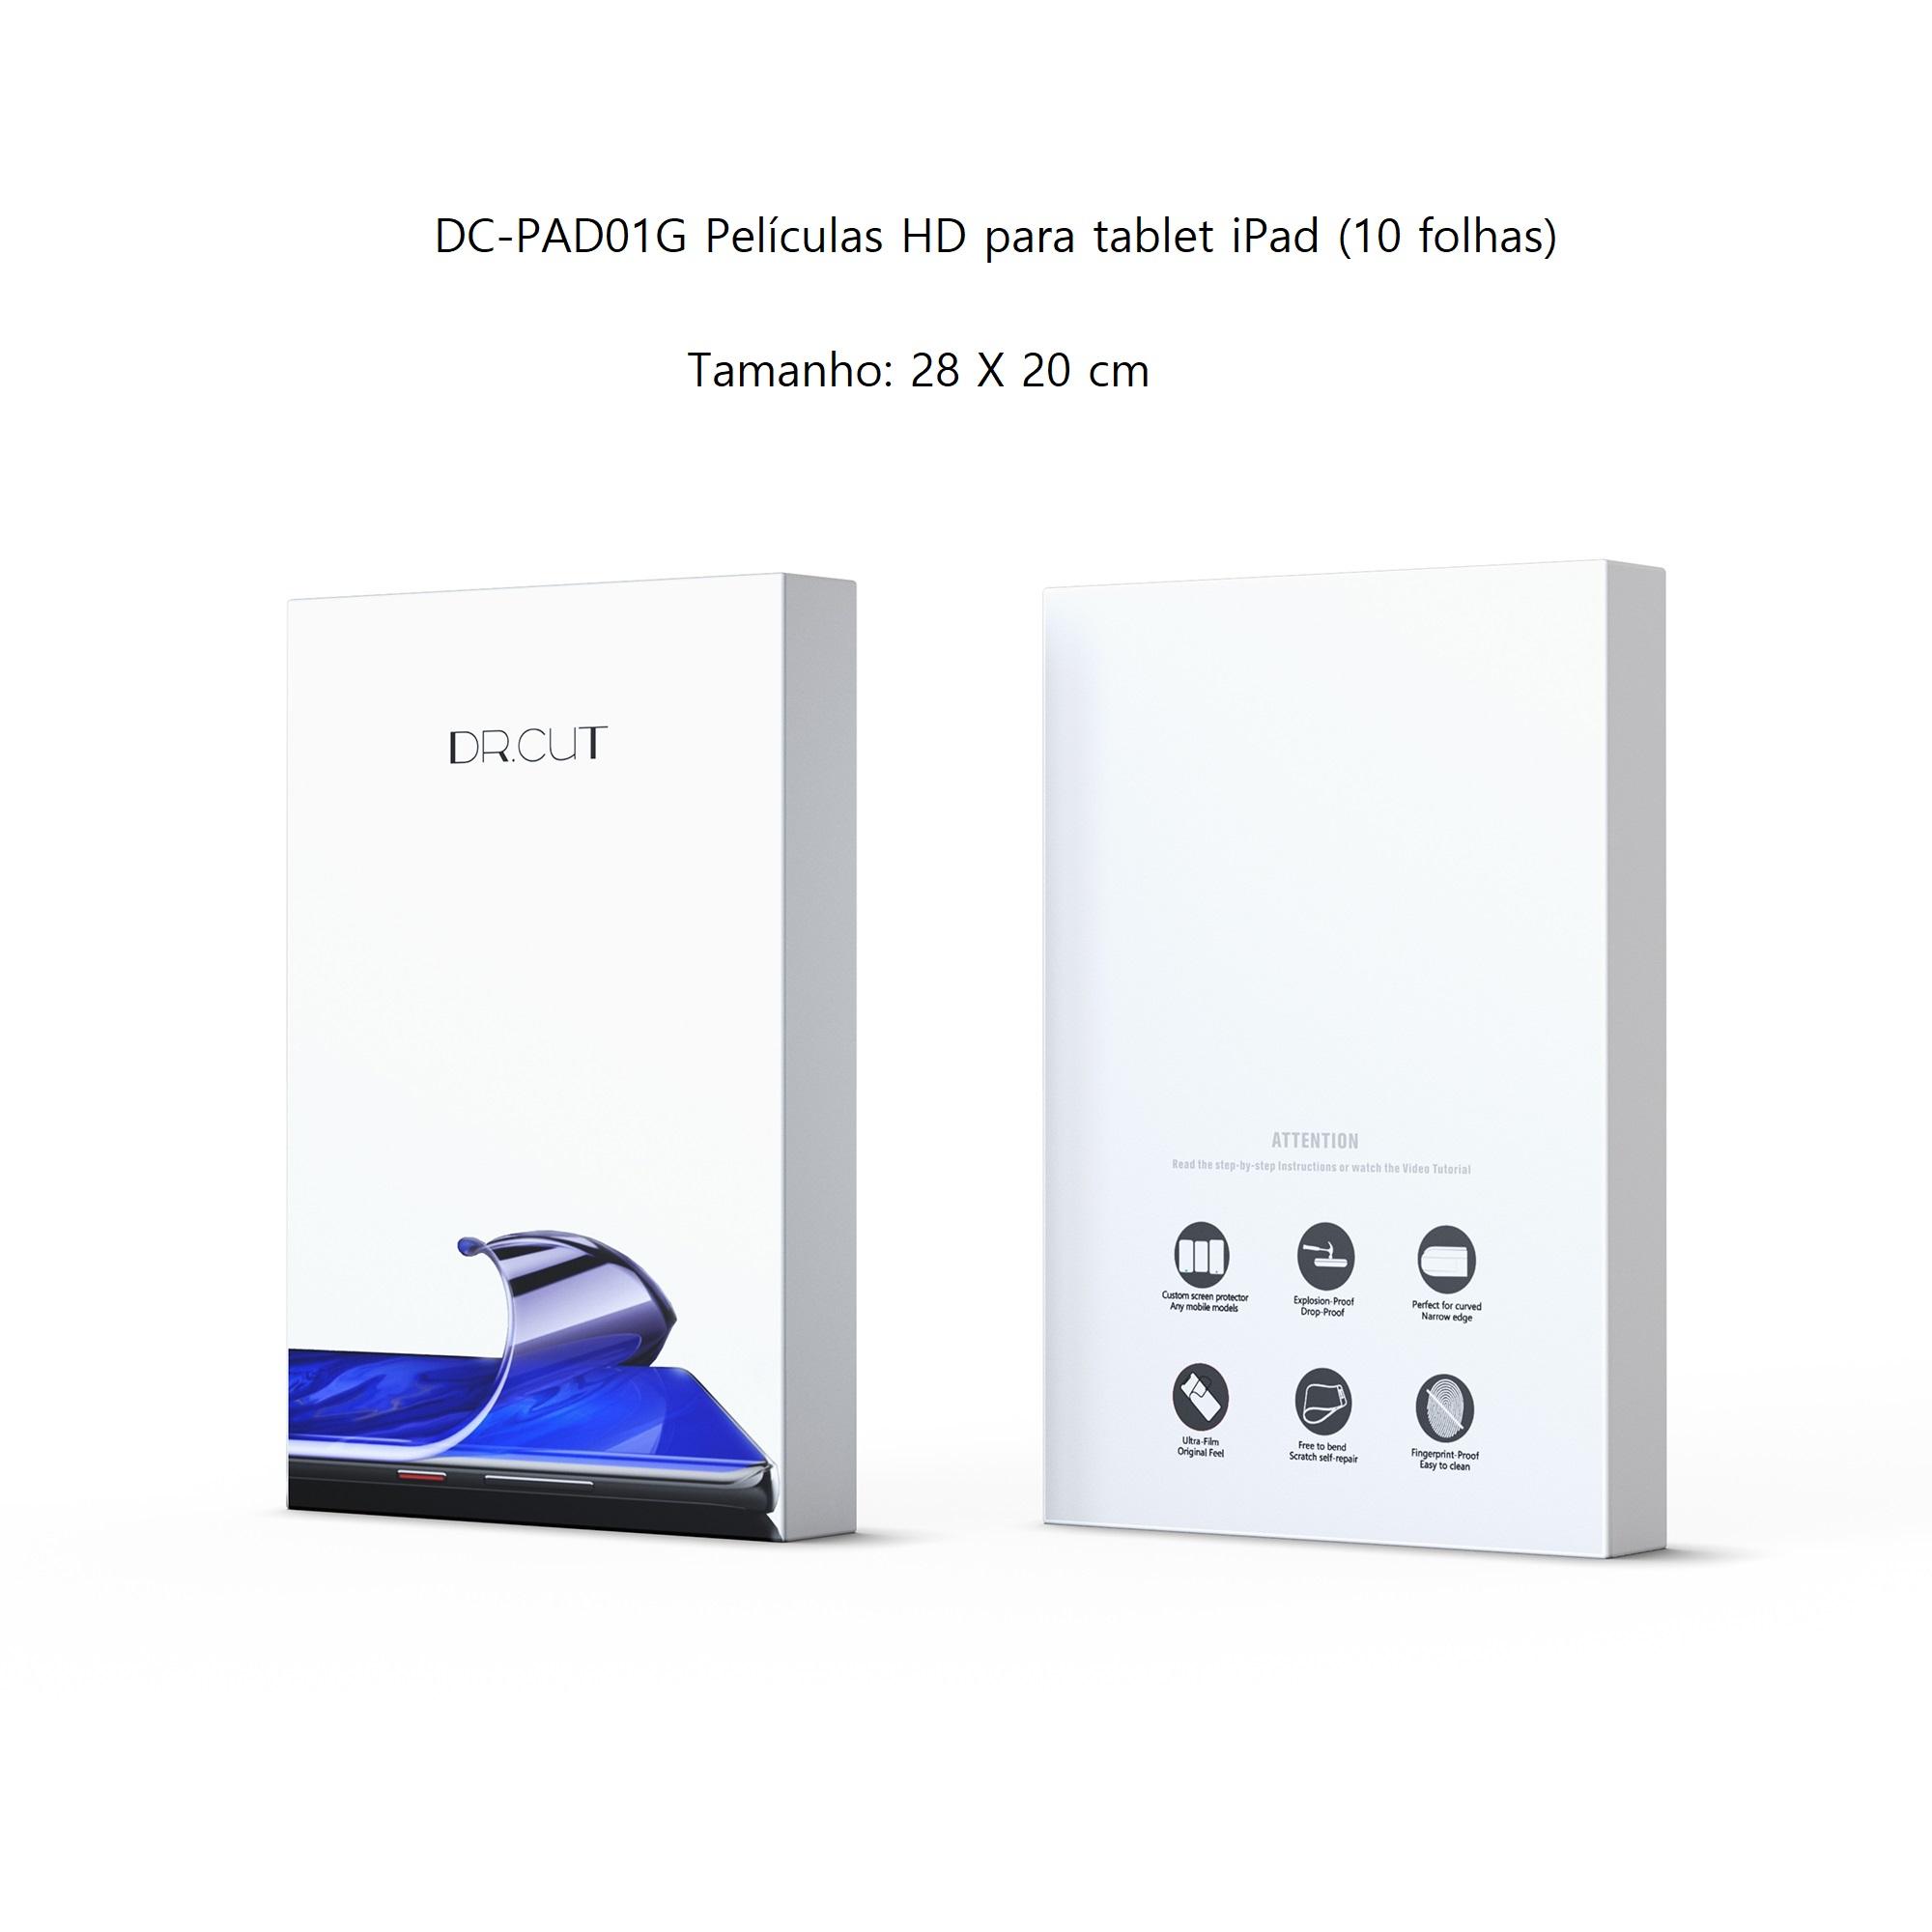 Dr. Cut DC-PAD01G Películas HD para tablet iPad (10 folhas) para Dr. Cut DC20 Película Hidrogel